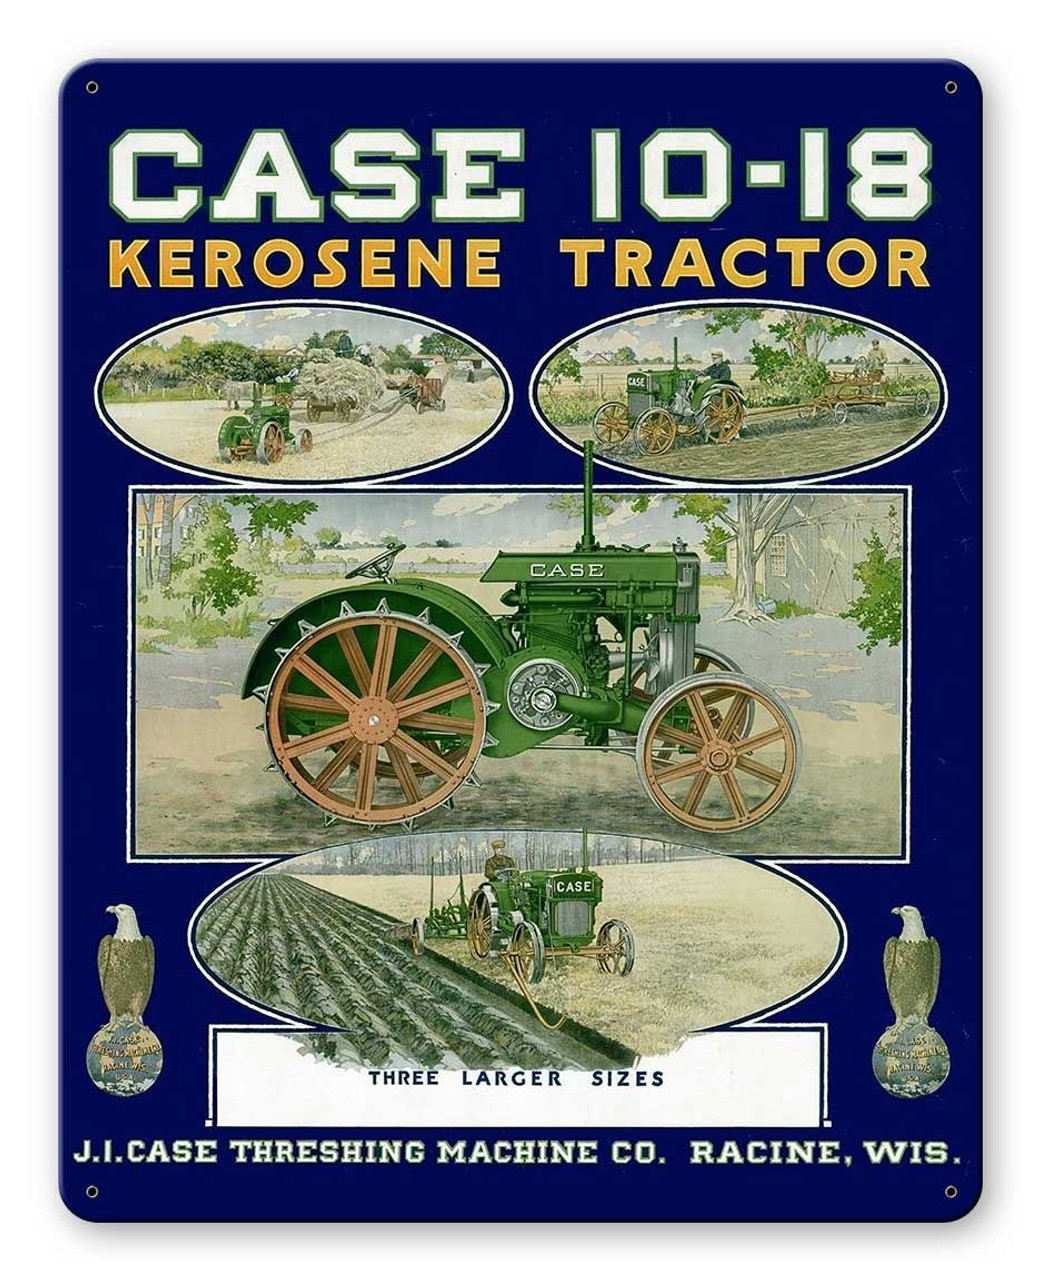 Case Kerosene Tractor Metal Sign 12 x 15 Inches